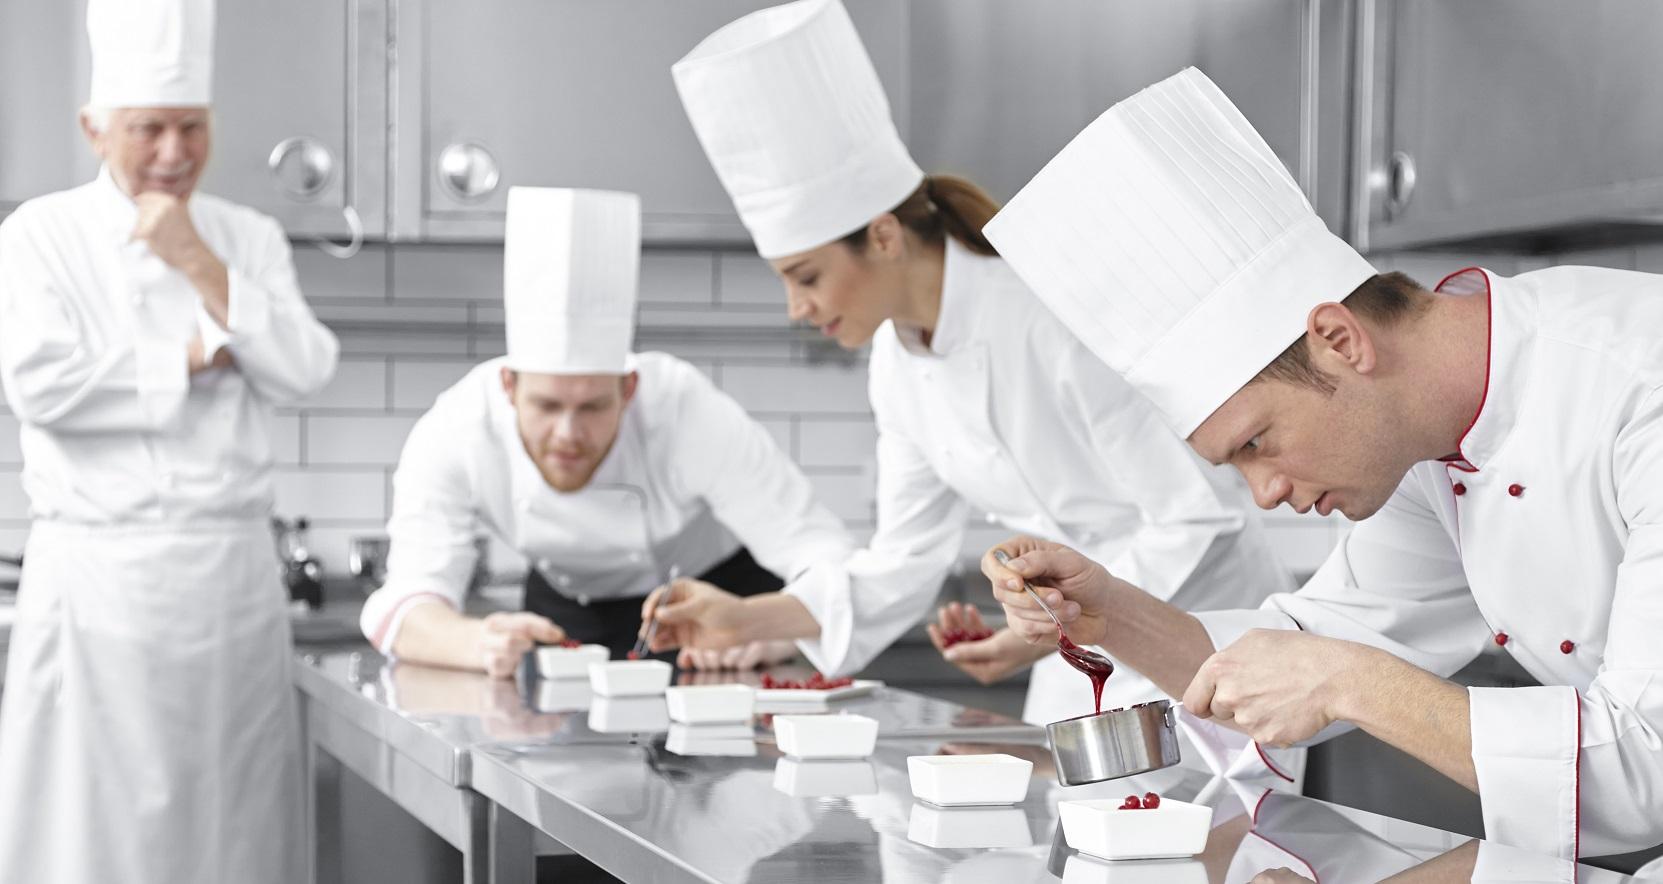 Chef decorating desserts